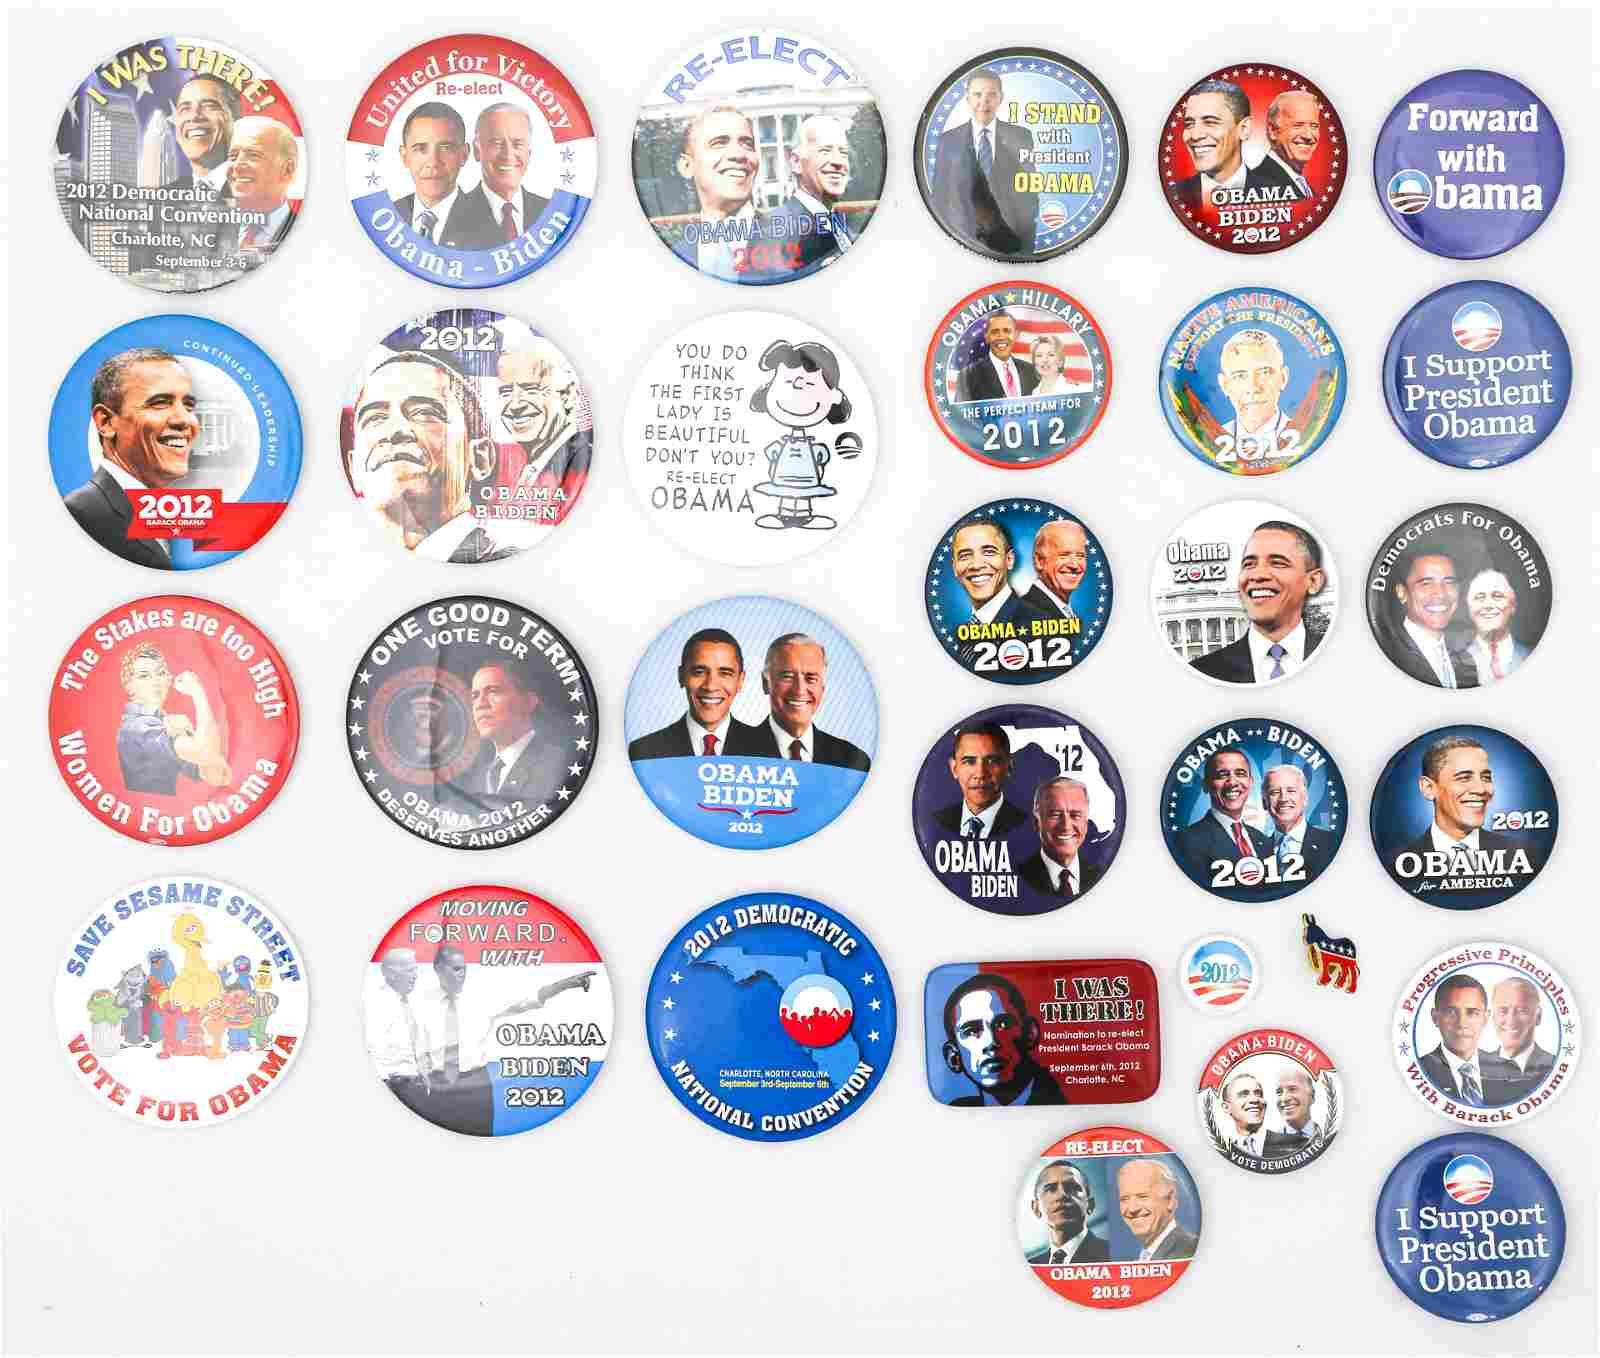 PRESIDENTIAL POLITICAL CAMPAIGN BUTTONS - OBAMA BIDEN